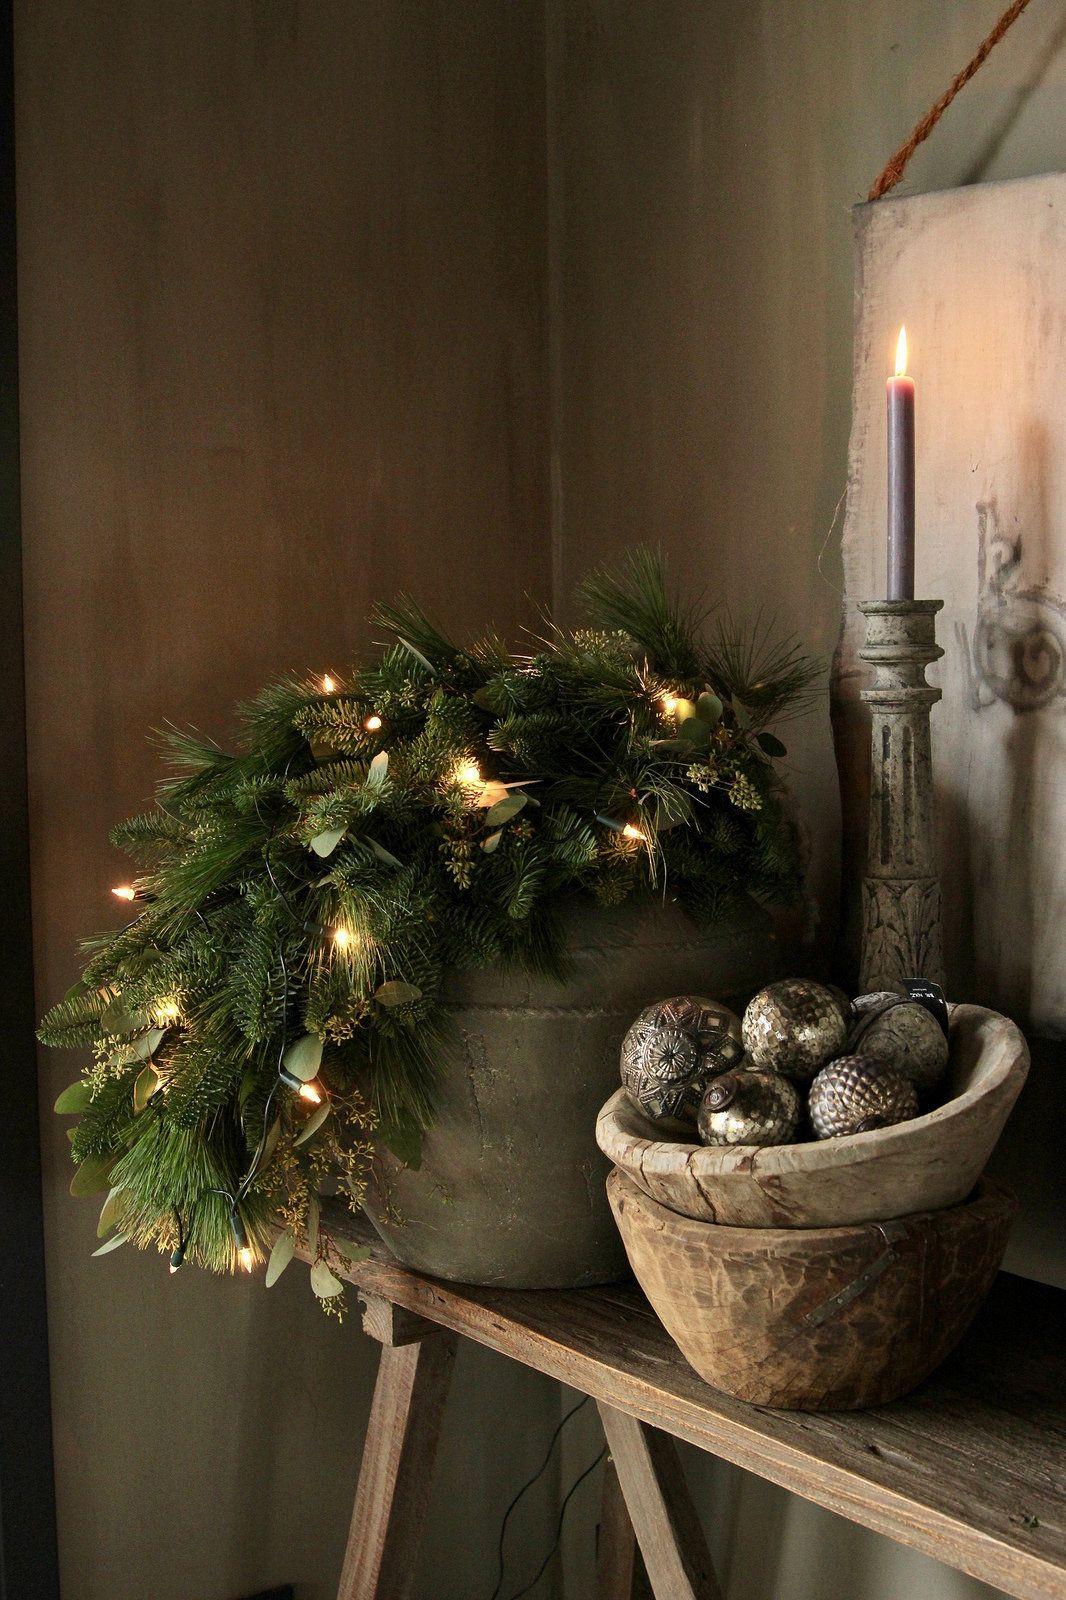 38412785461_9b17aa889f_h.jpg (1066×1600) | Christmas and winter ...